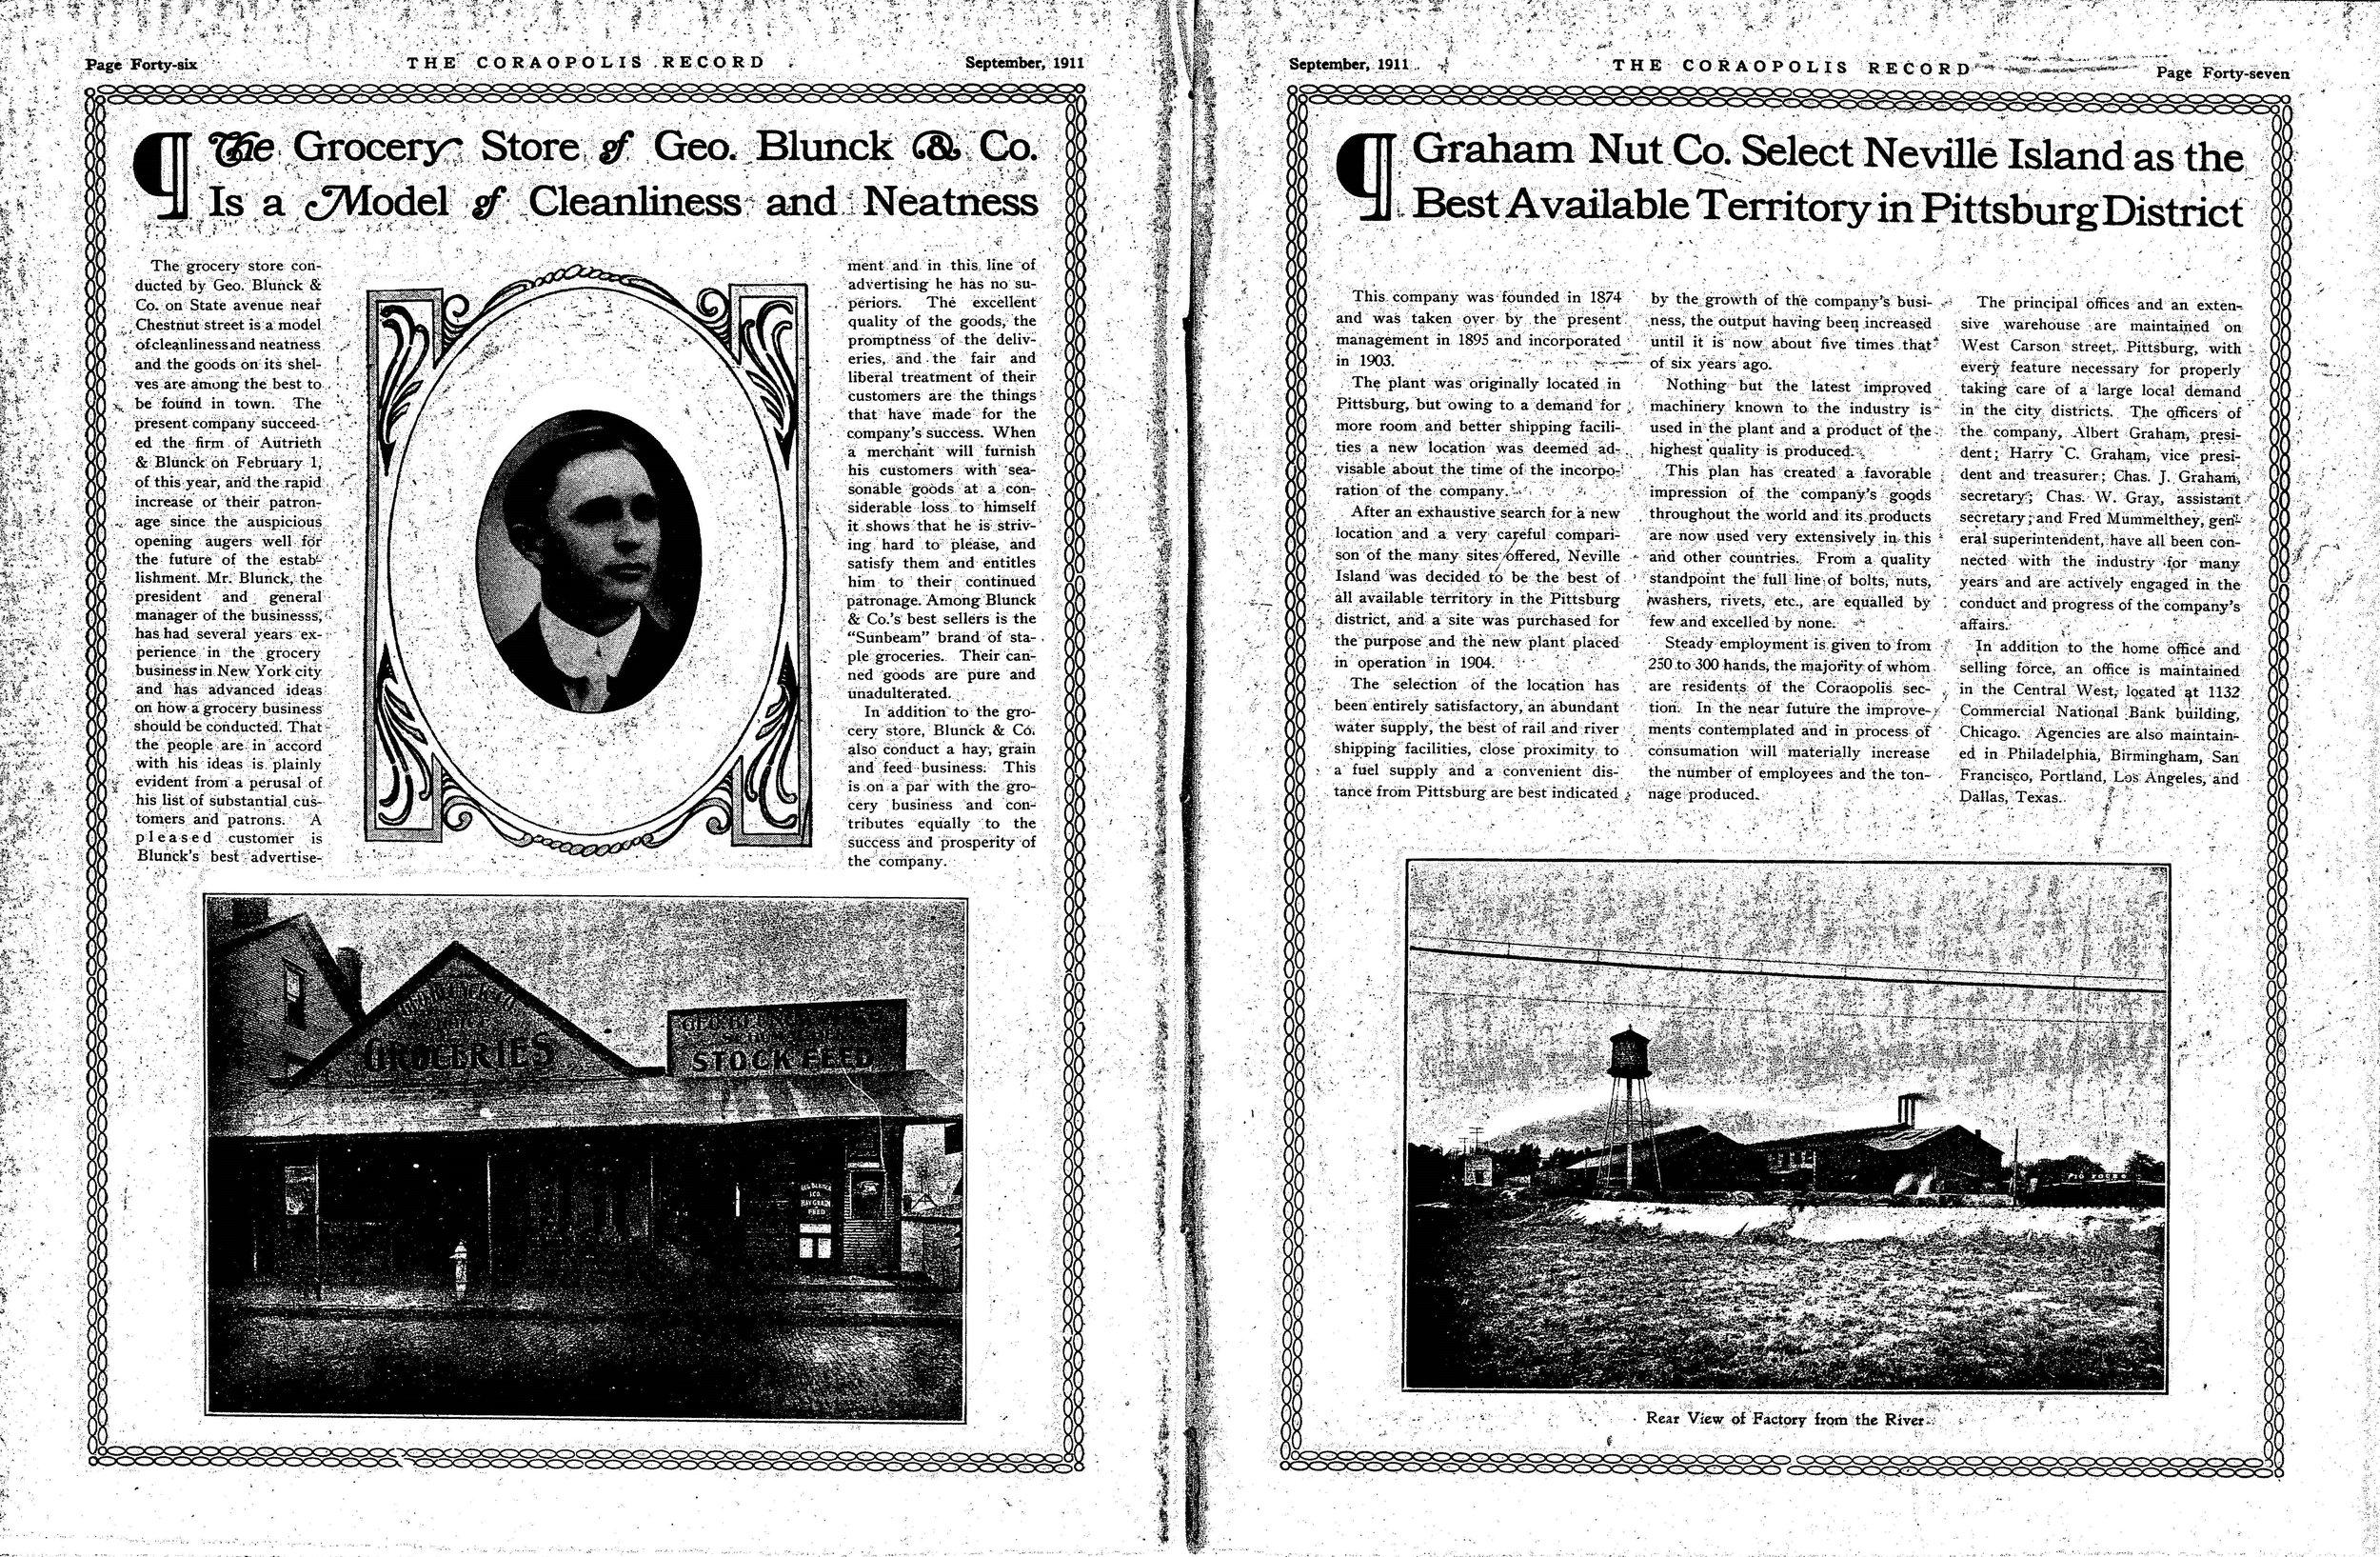 1911-09-15 The Coraopolis Record_Page_25.jpg